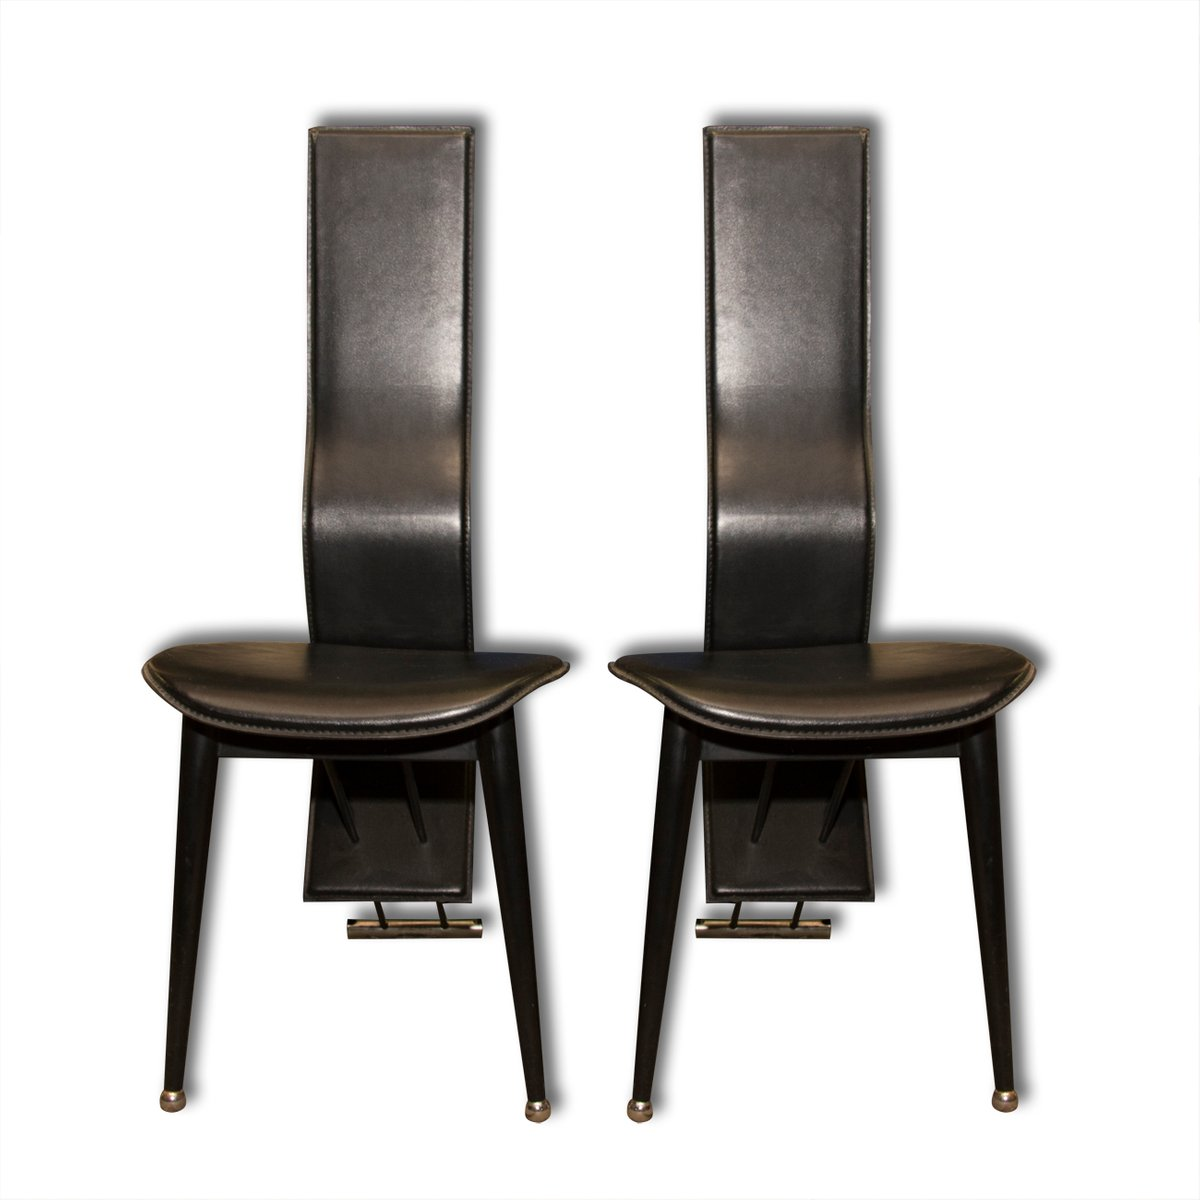 Vintage Leather Dining Chairs italian vintage high back leather dining chairs, 1980s, set of 2